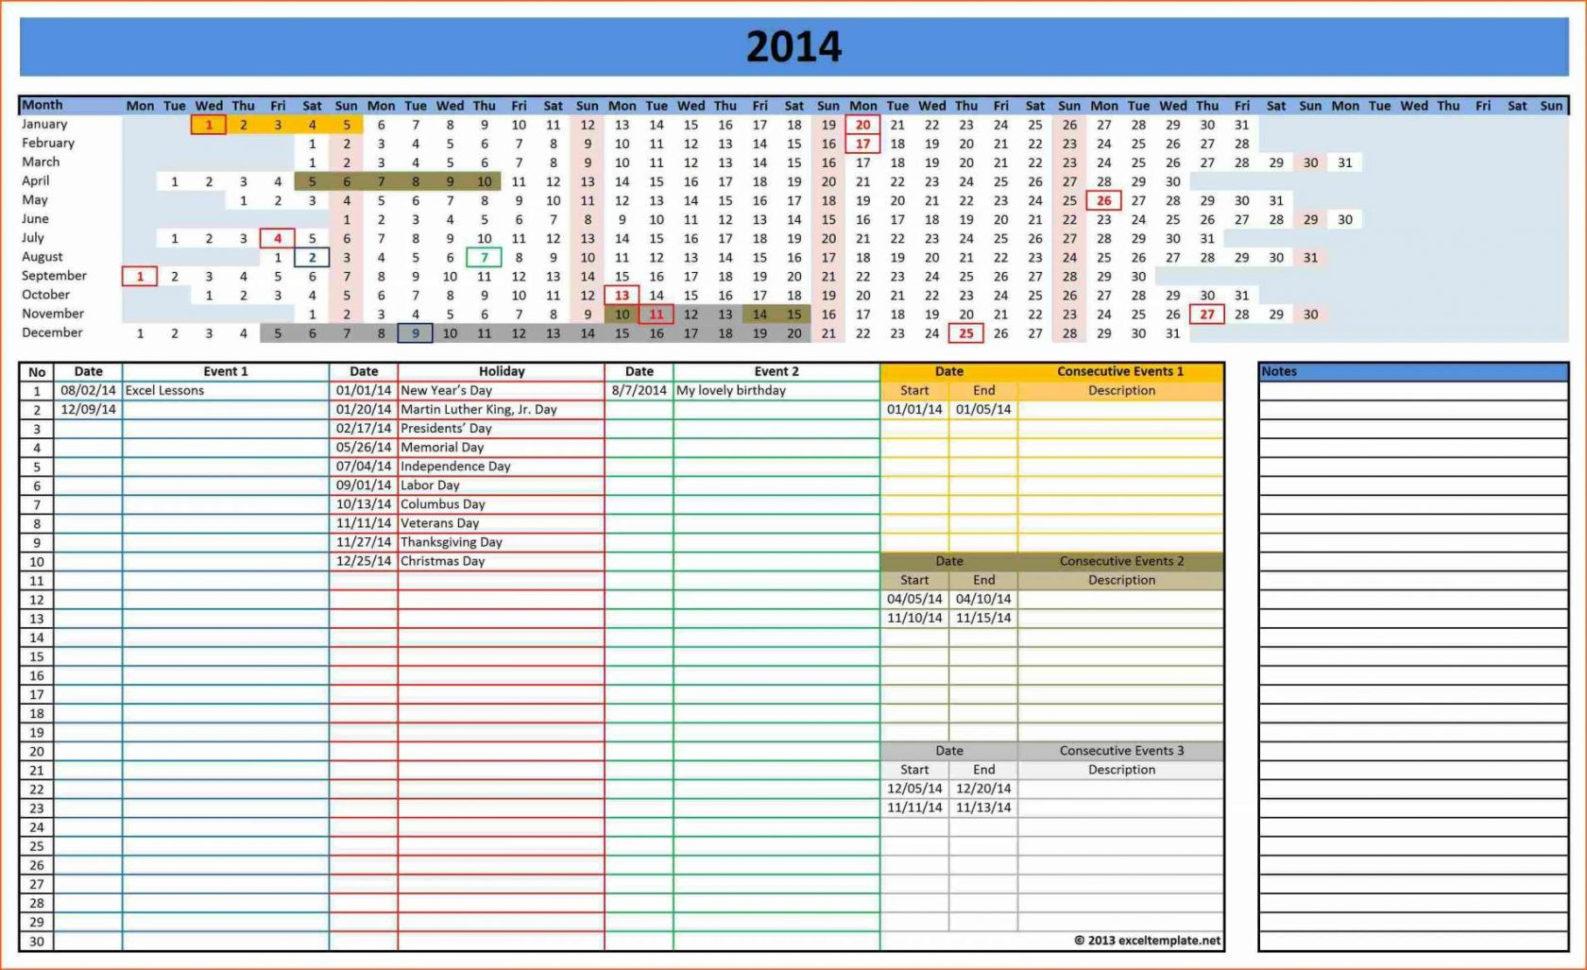 Wedding Budgetlculator Spreadsheet Example Fantastisch Einfaches For Online Budget Calculator Spreadsheet